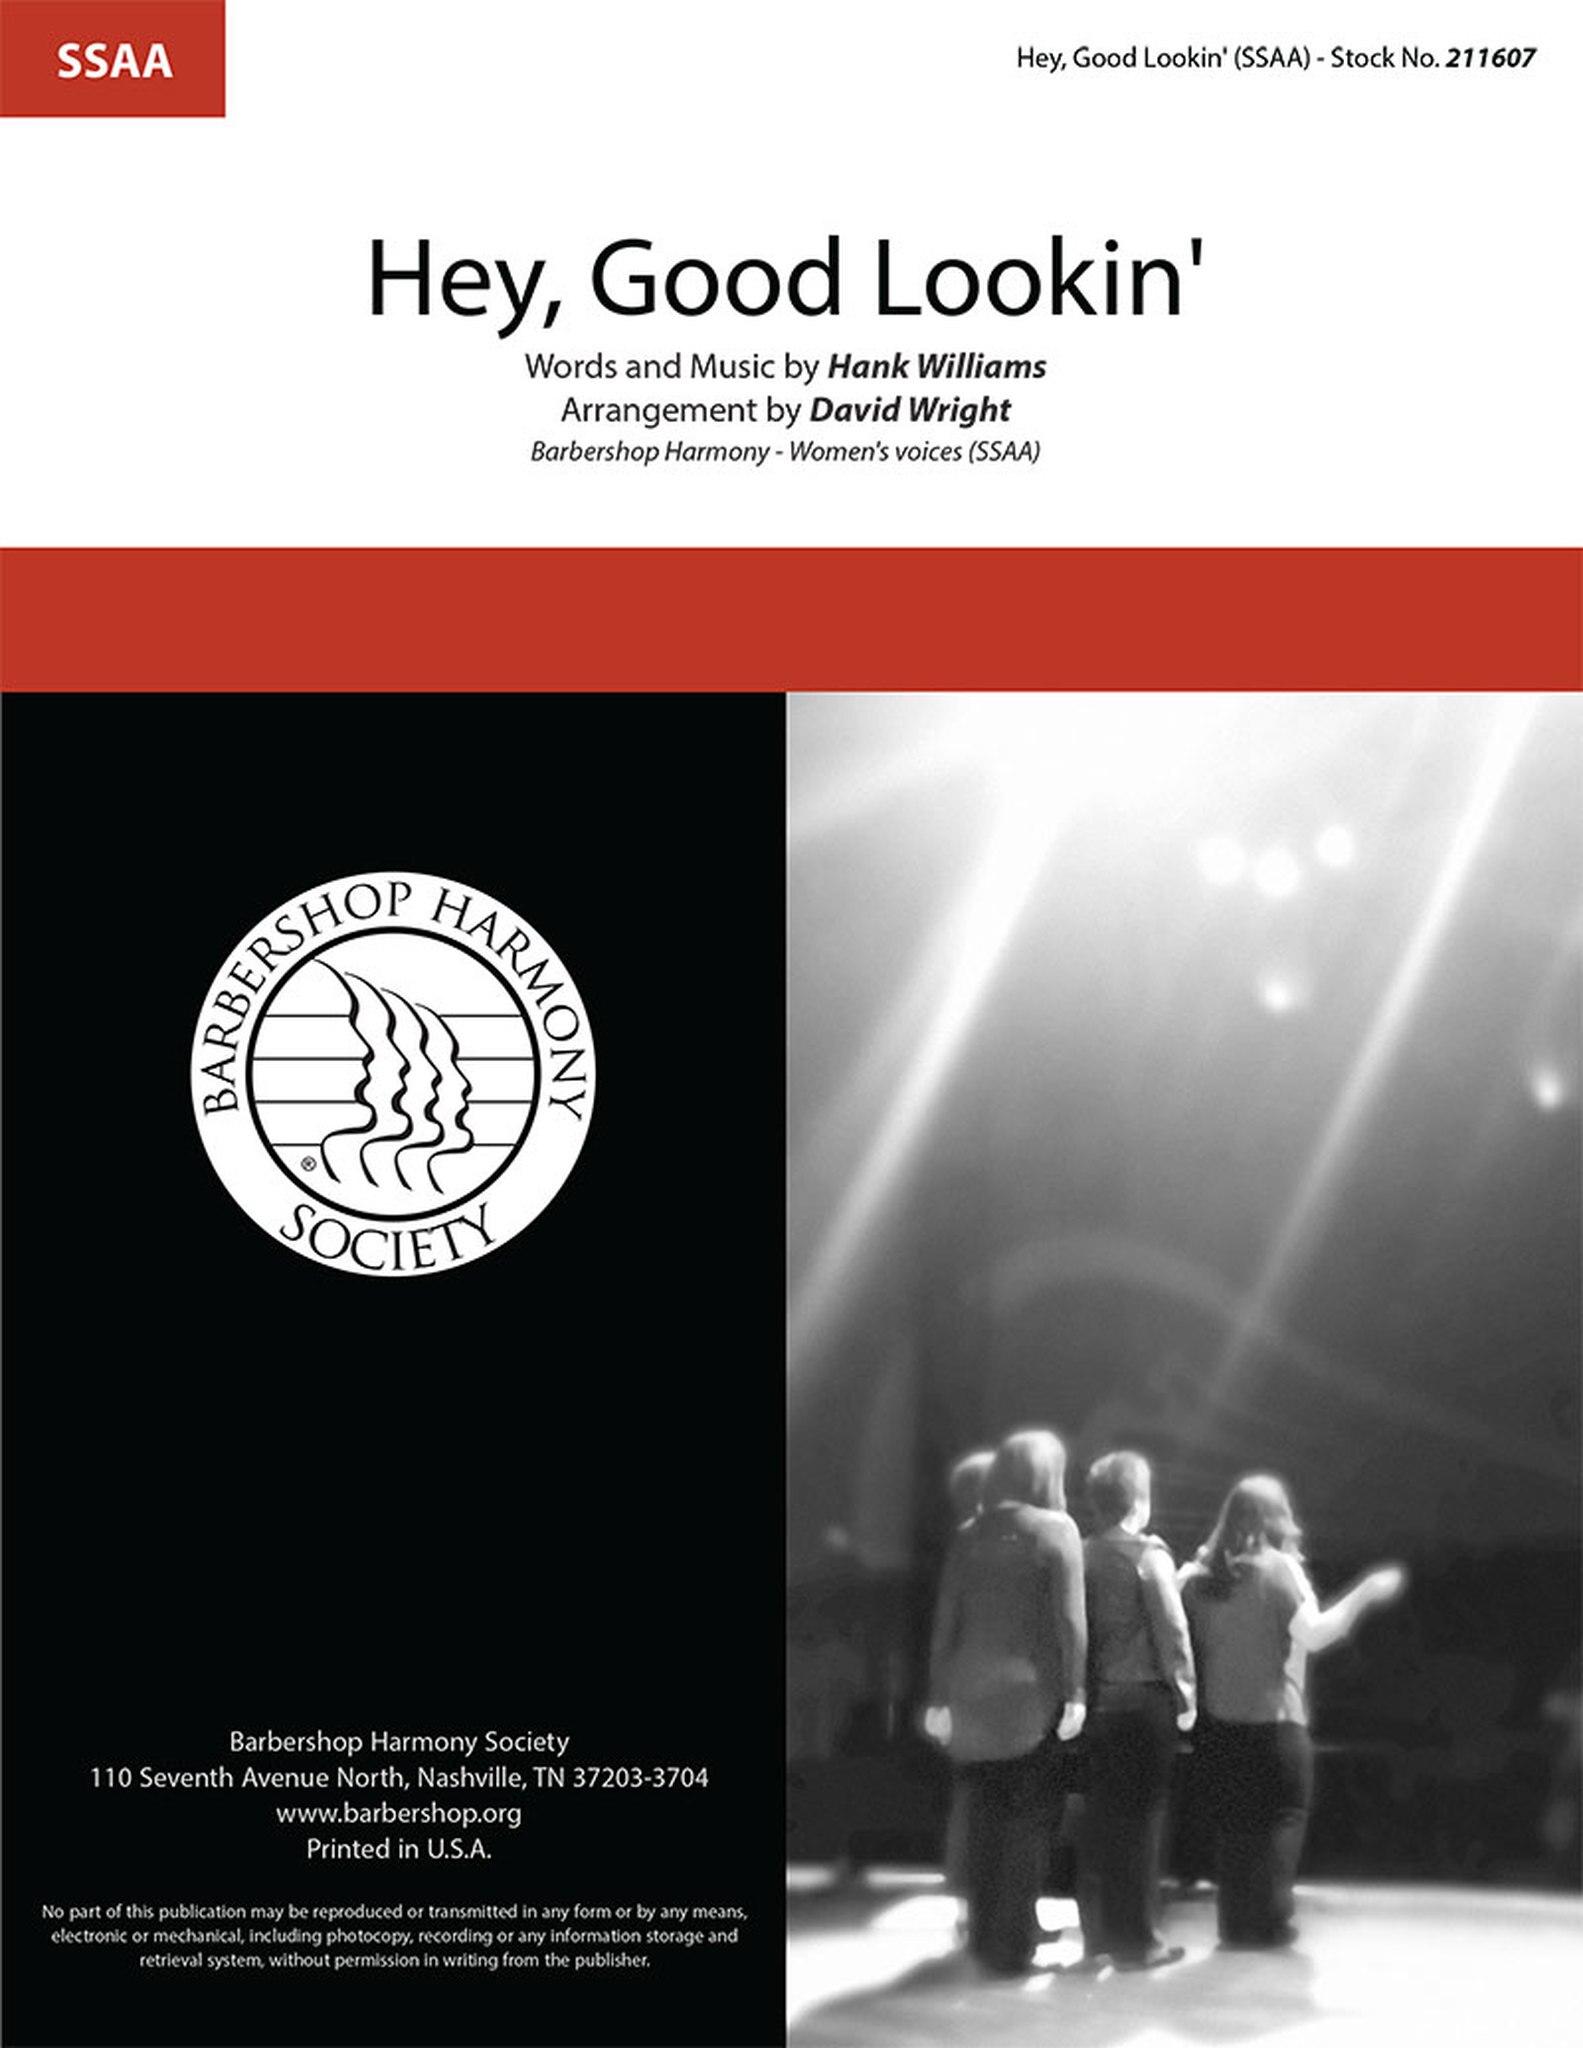 Hey, Good Lookin' : SSAA : David Wright : Hank Williams : Sheet Music : 211607